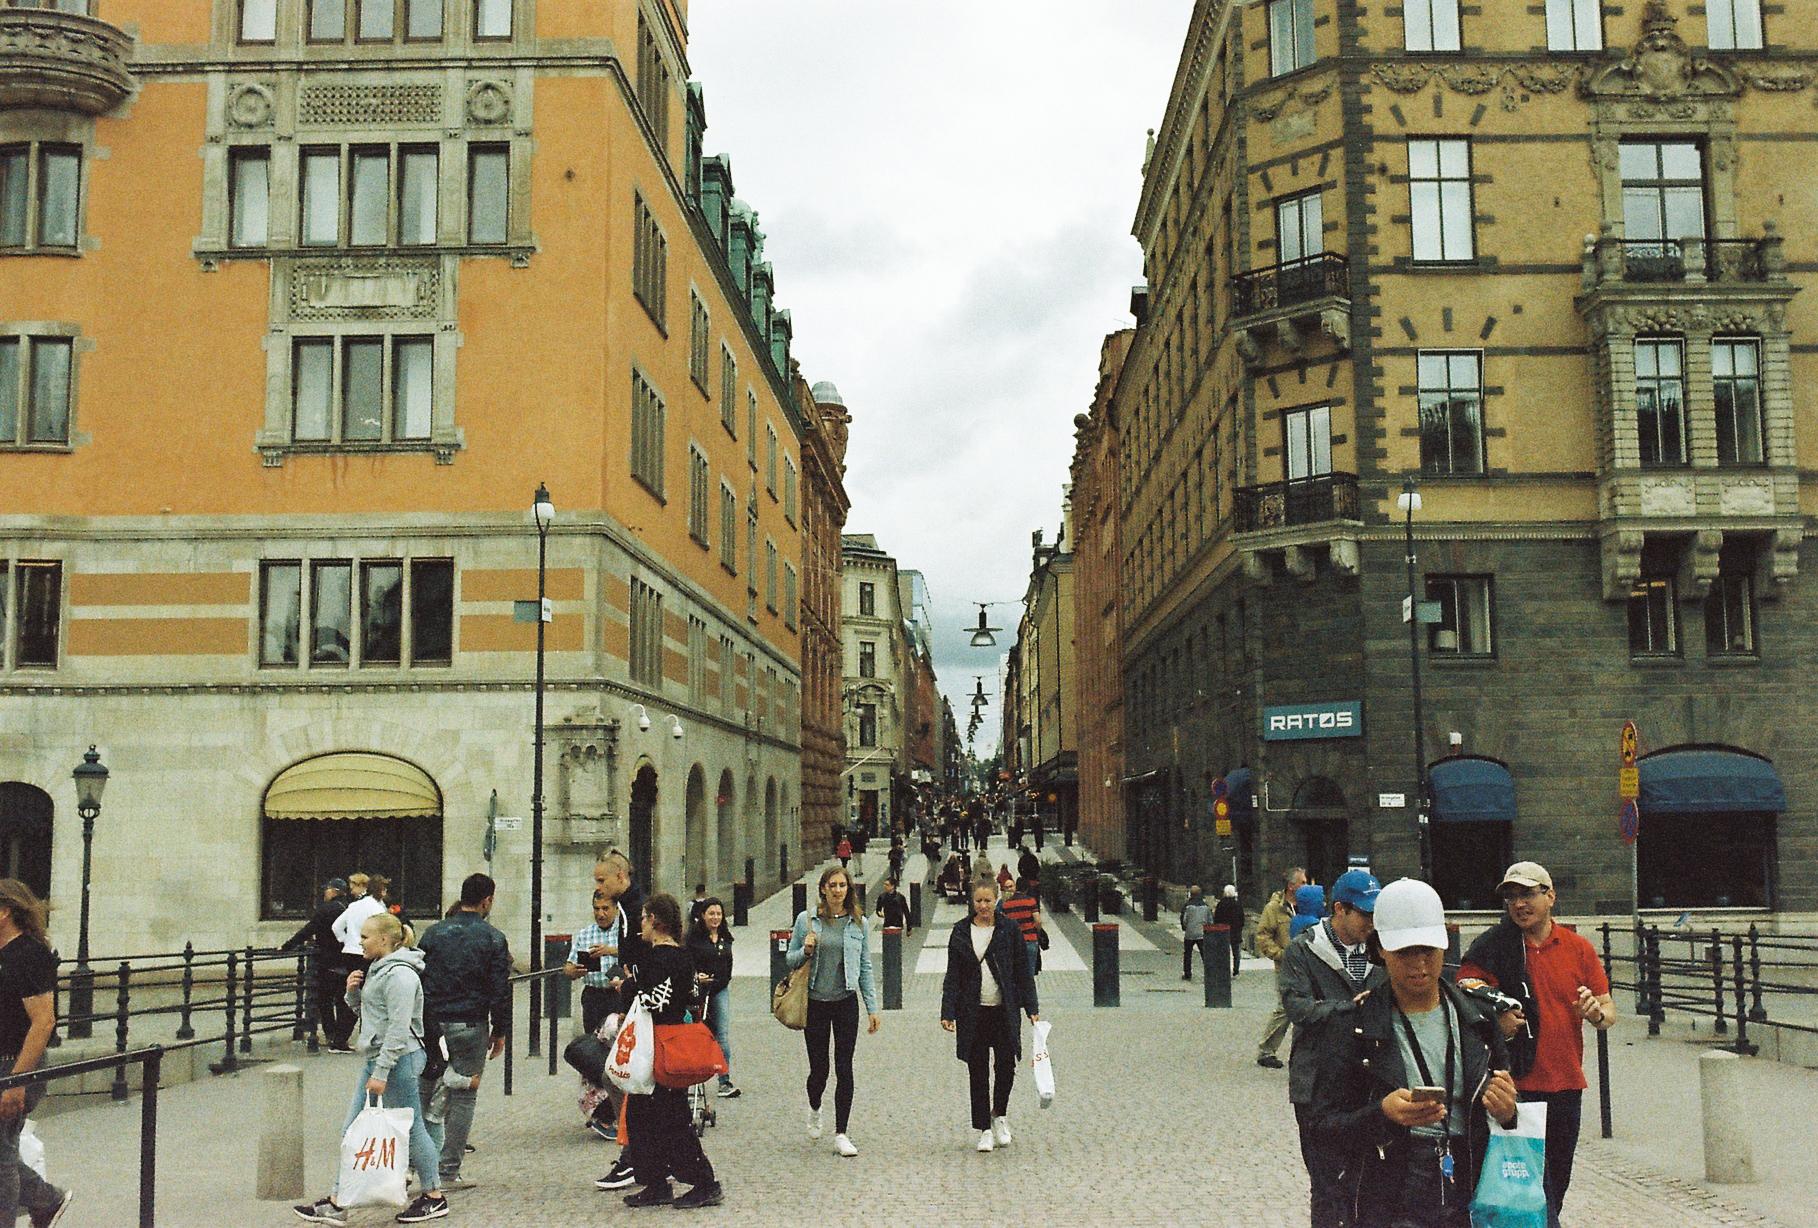 swedish-midsommar-2018-35mm-39.jpg